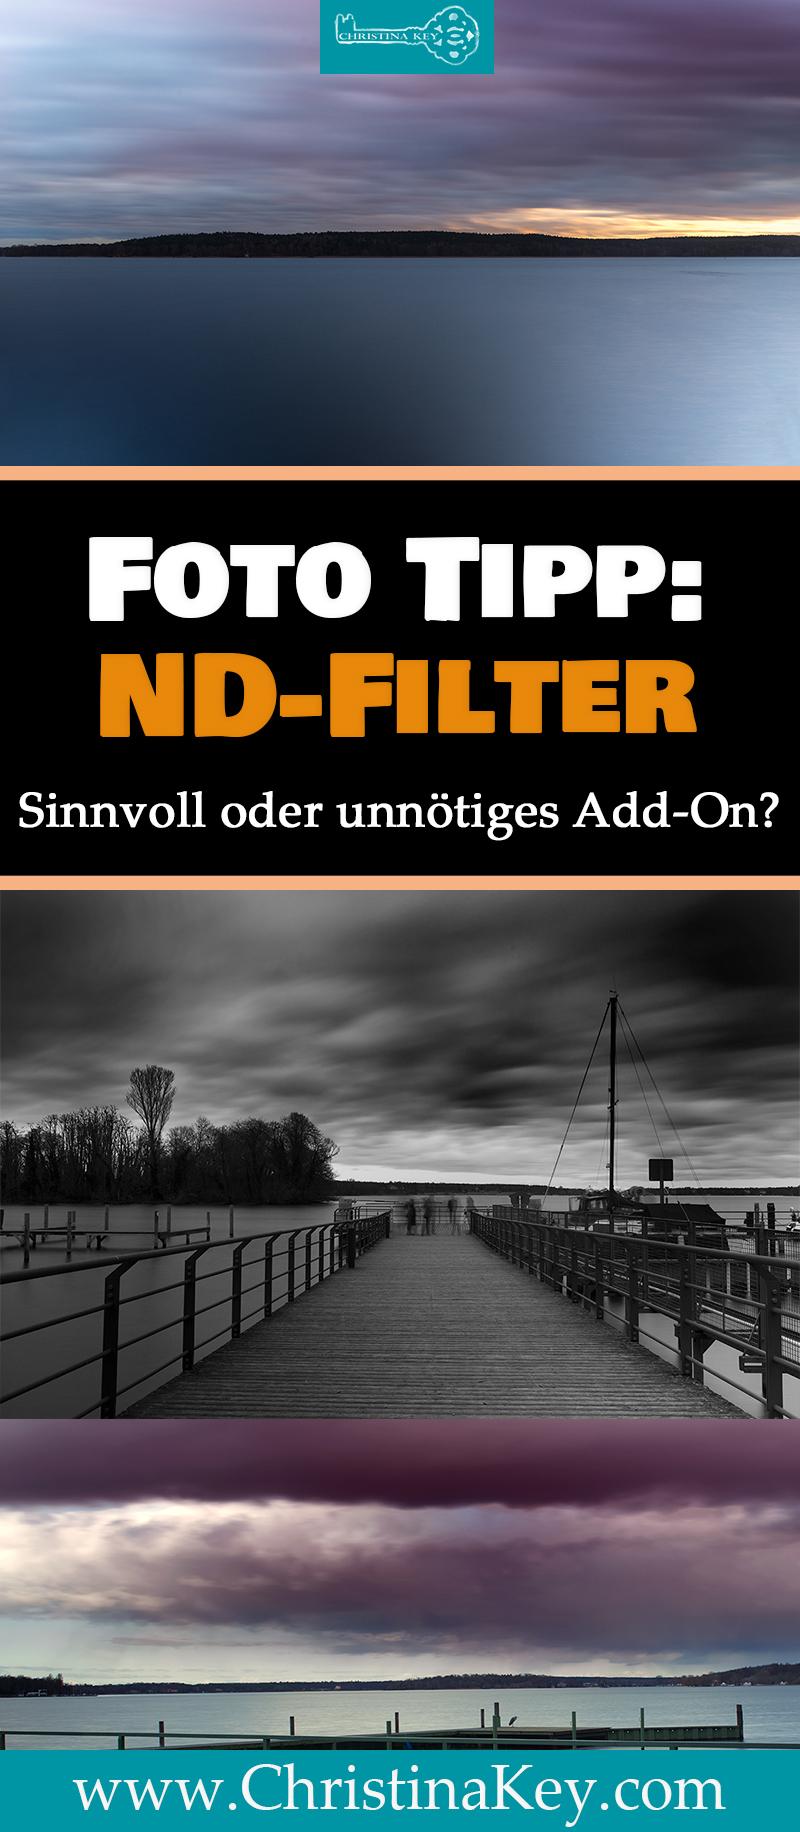 ND-Filter Fotografie Tipps